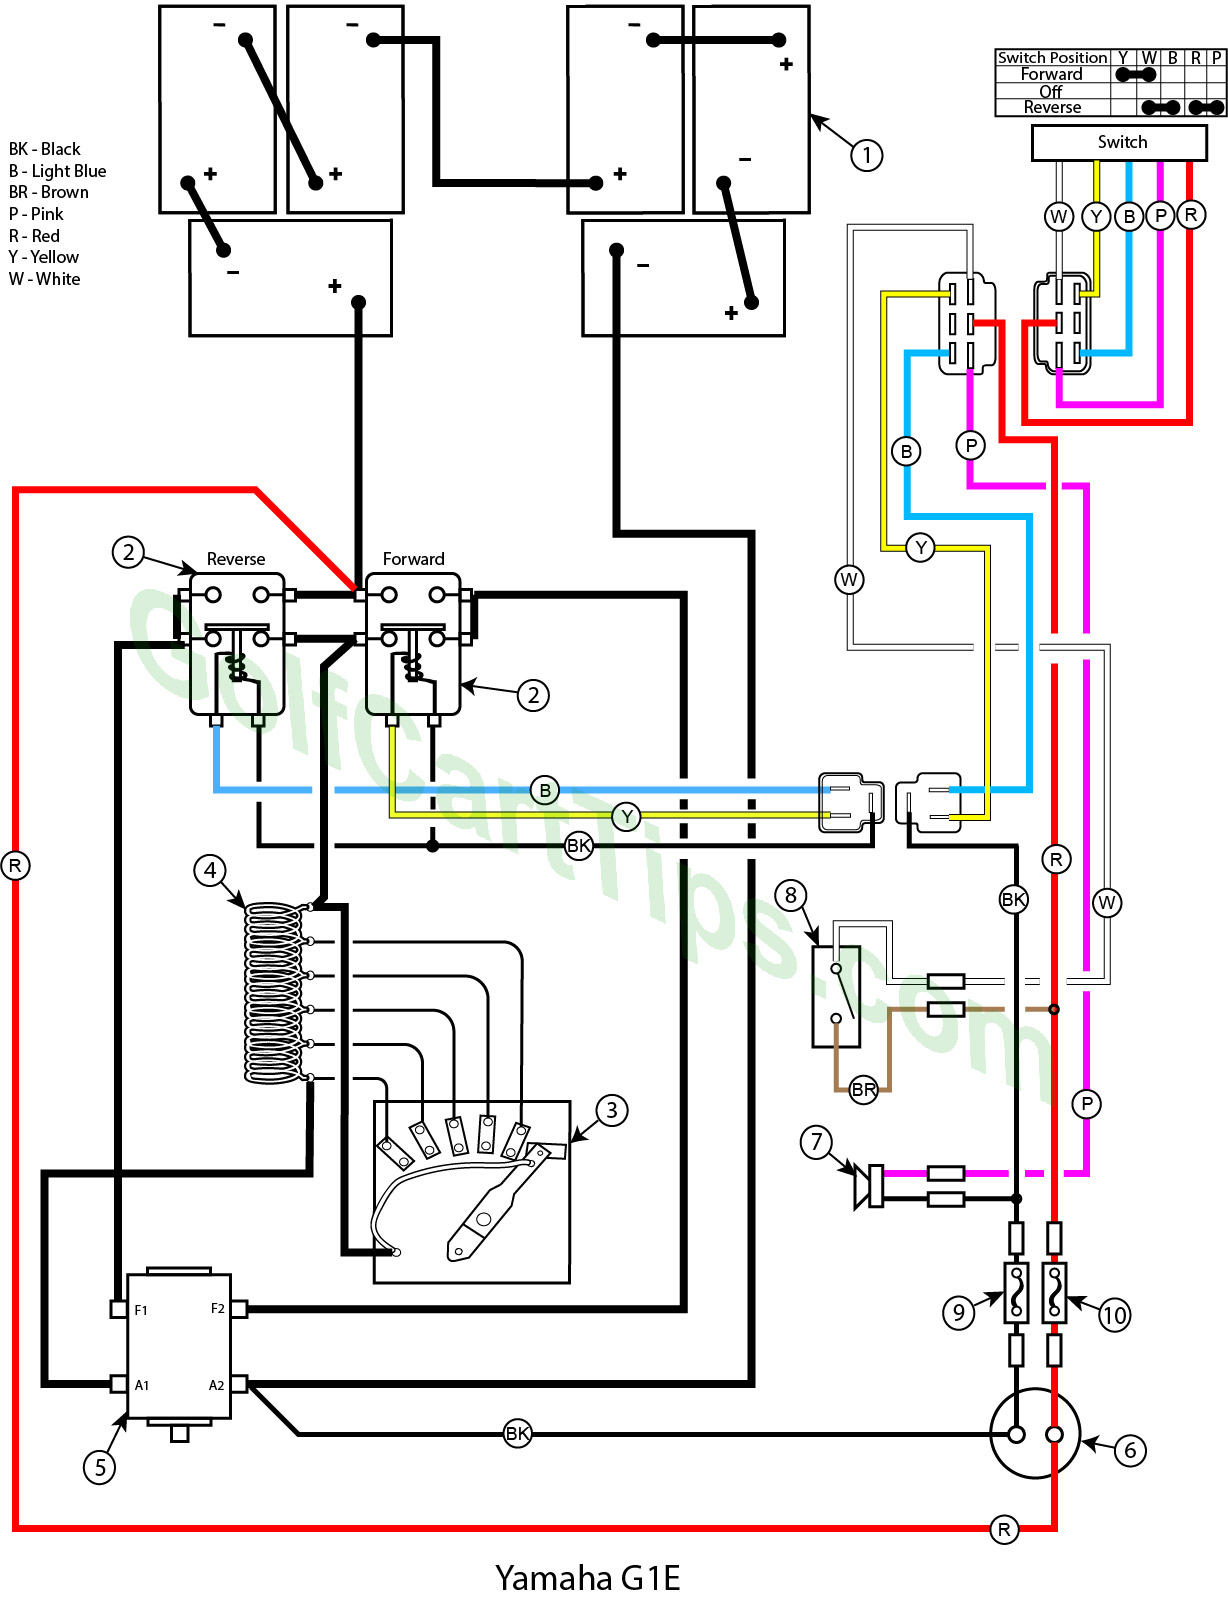 hight resolution of g1e 1980 86 yamaha g1e electrical diagram